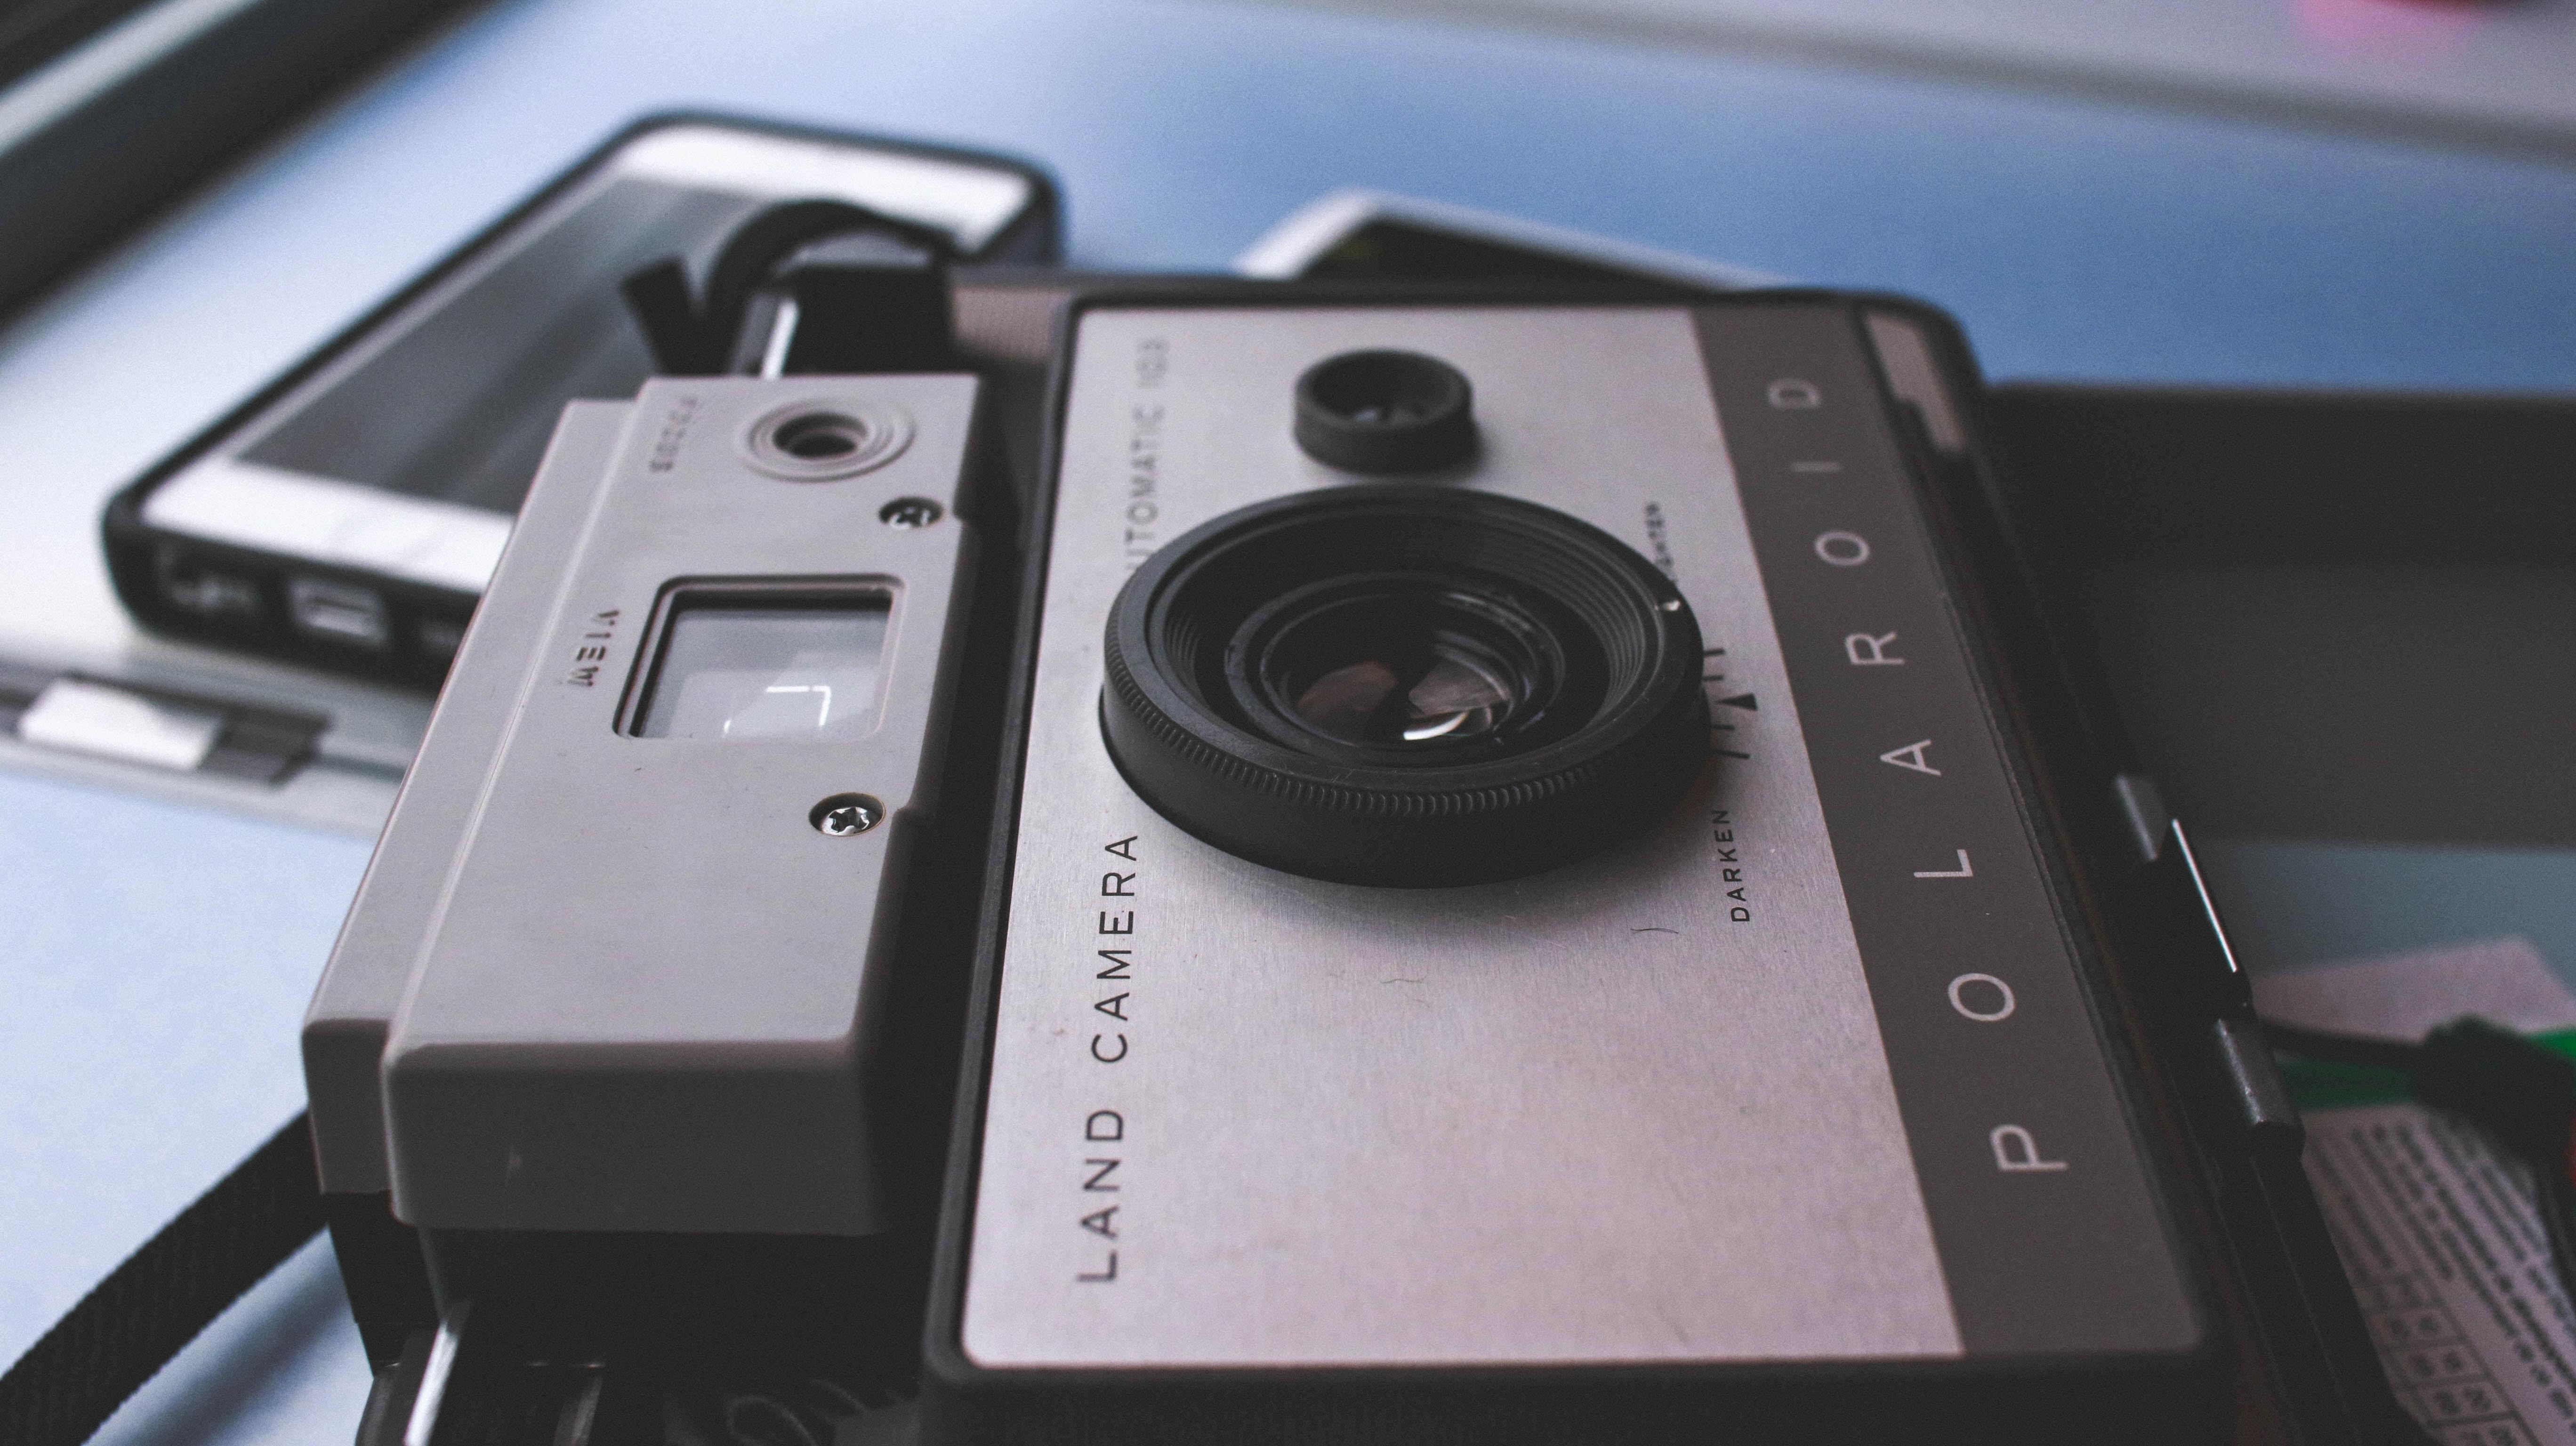 Macro of vintage polaroid camera on surface near iPhone mobile phone